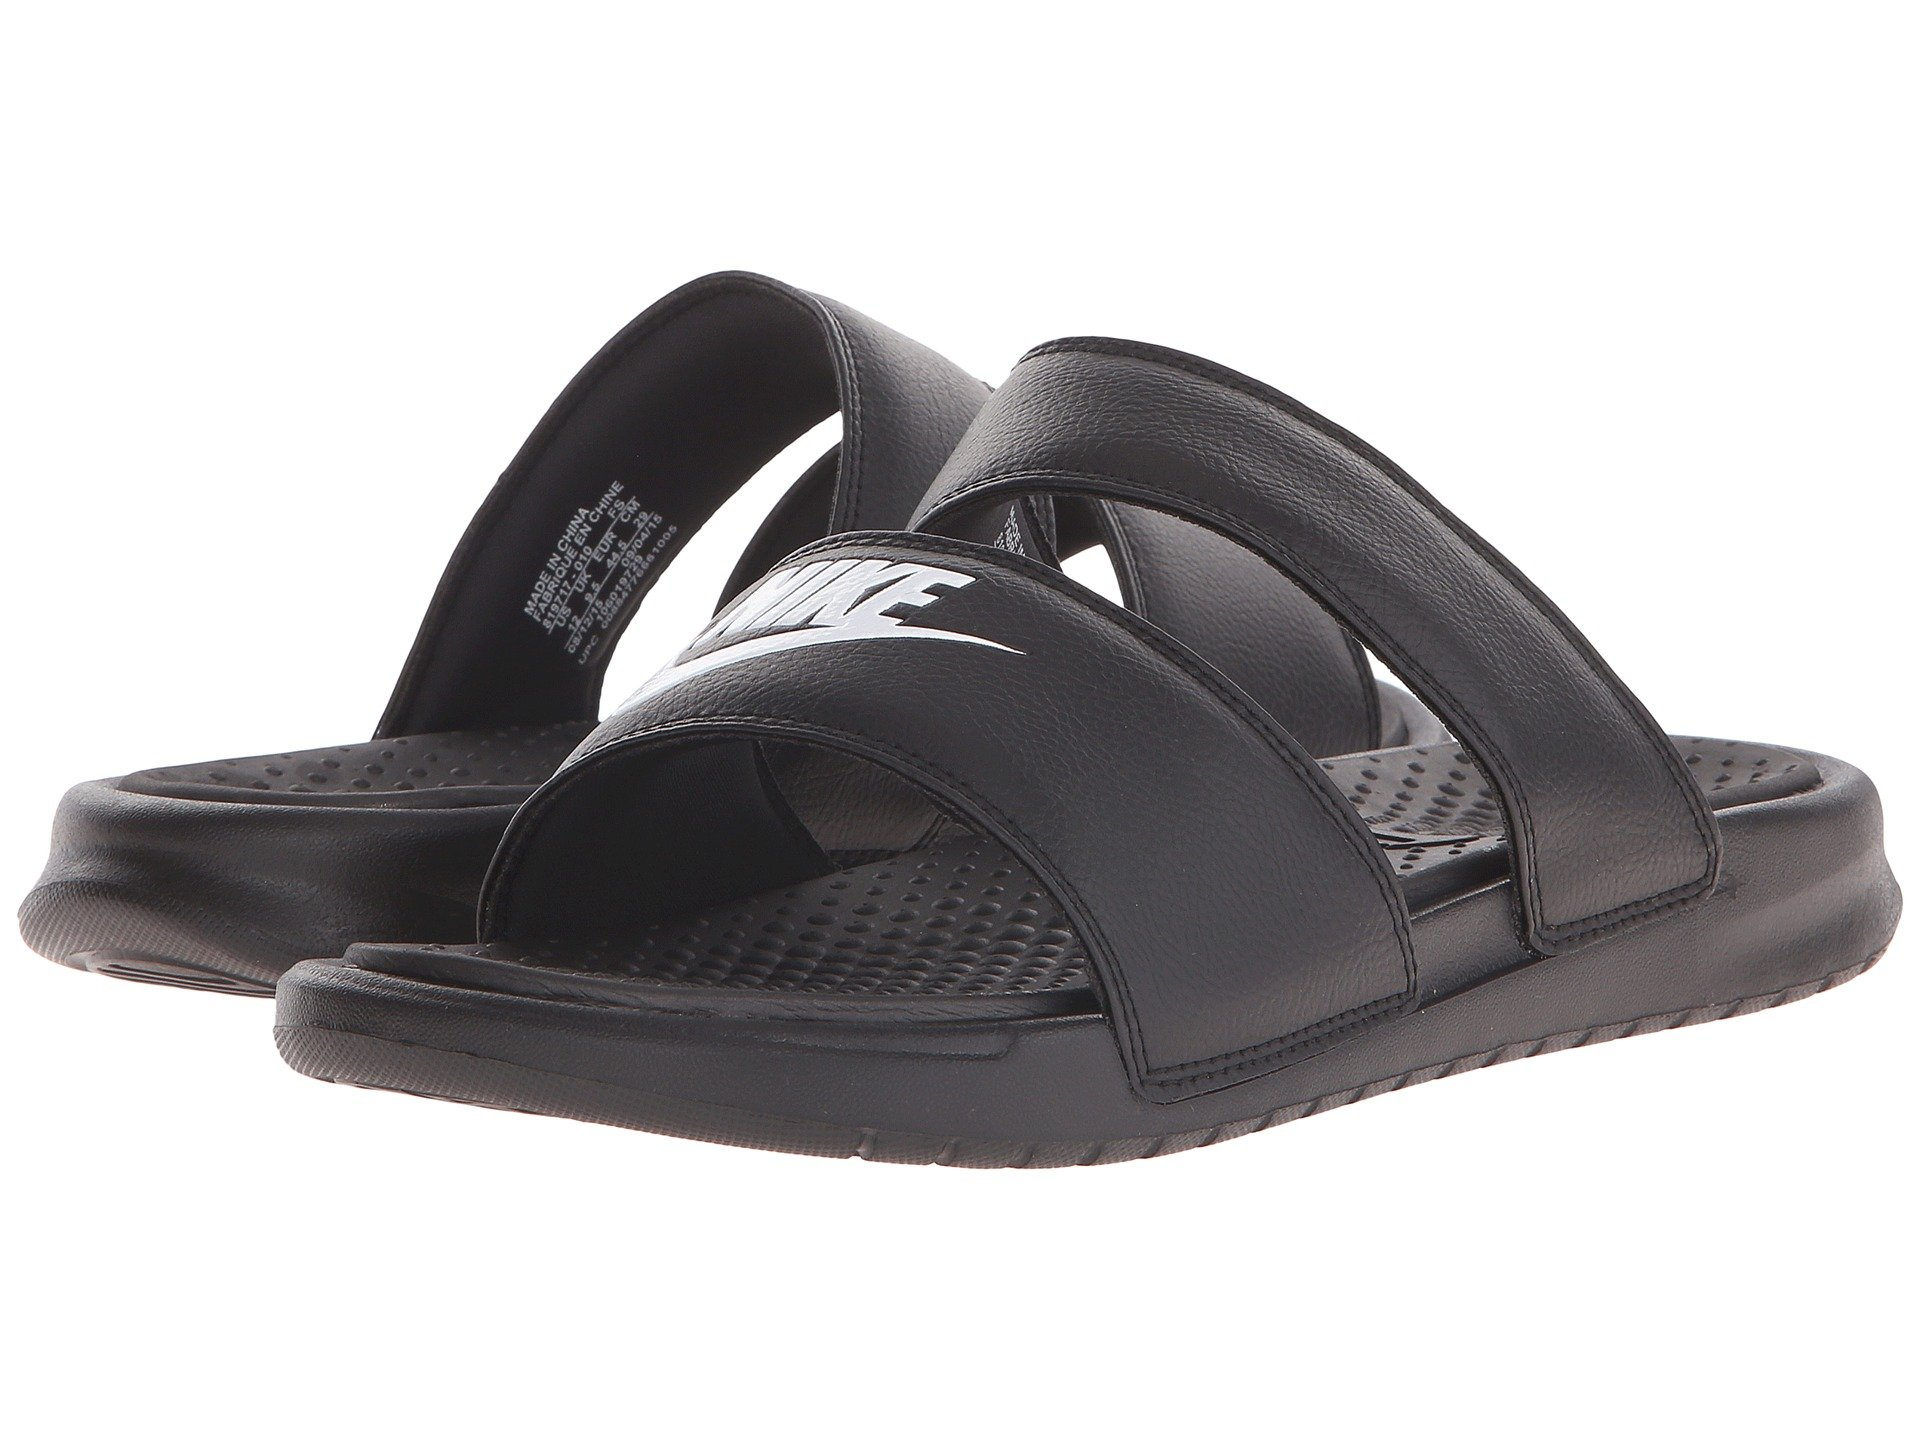 35b75fd38178c Nike sandals